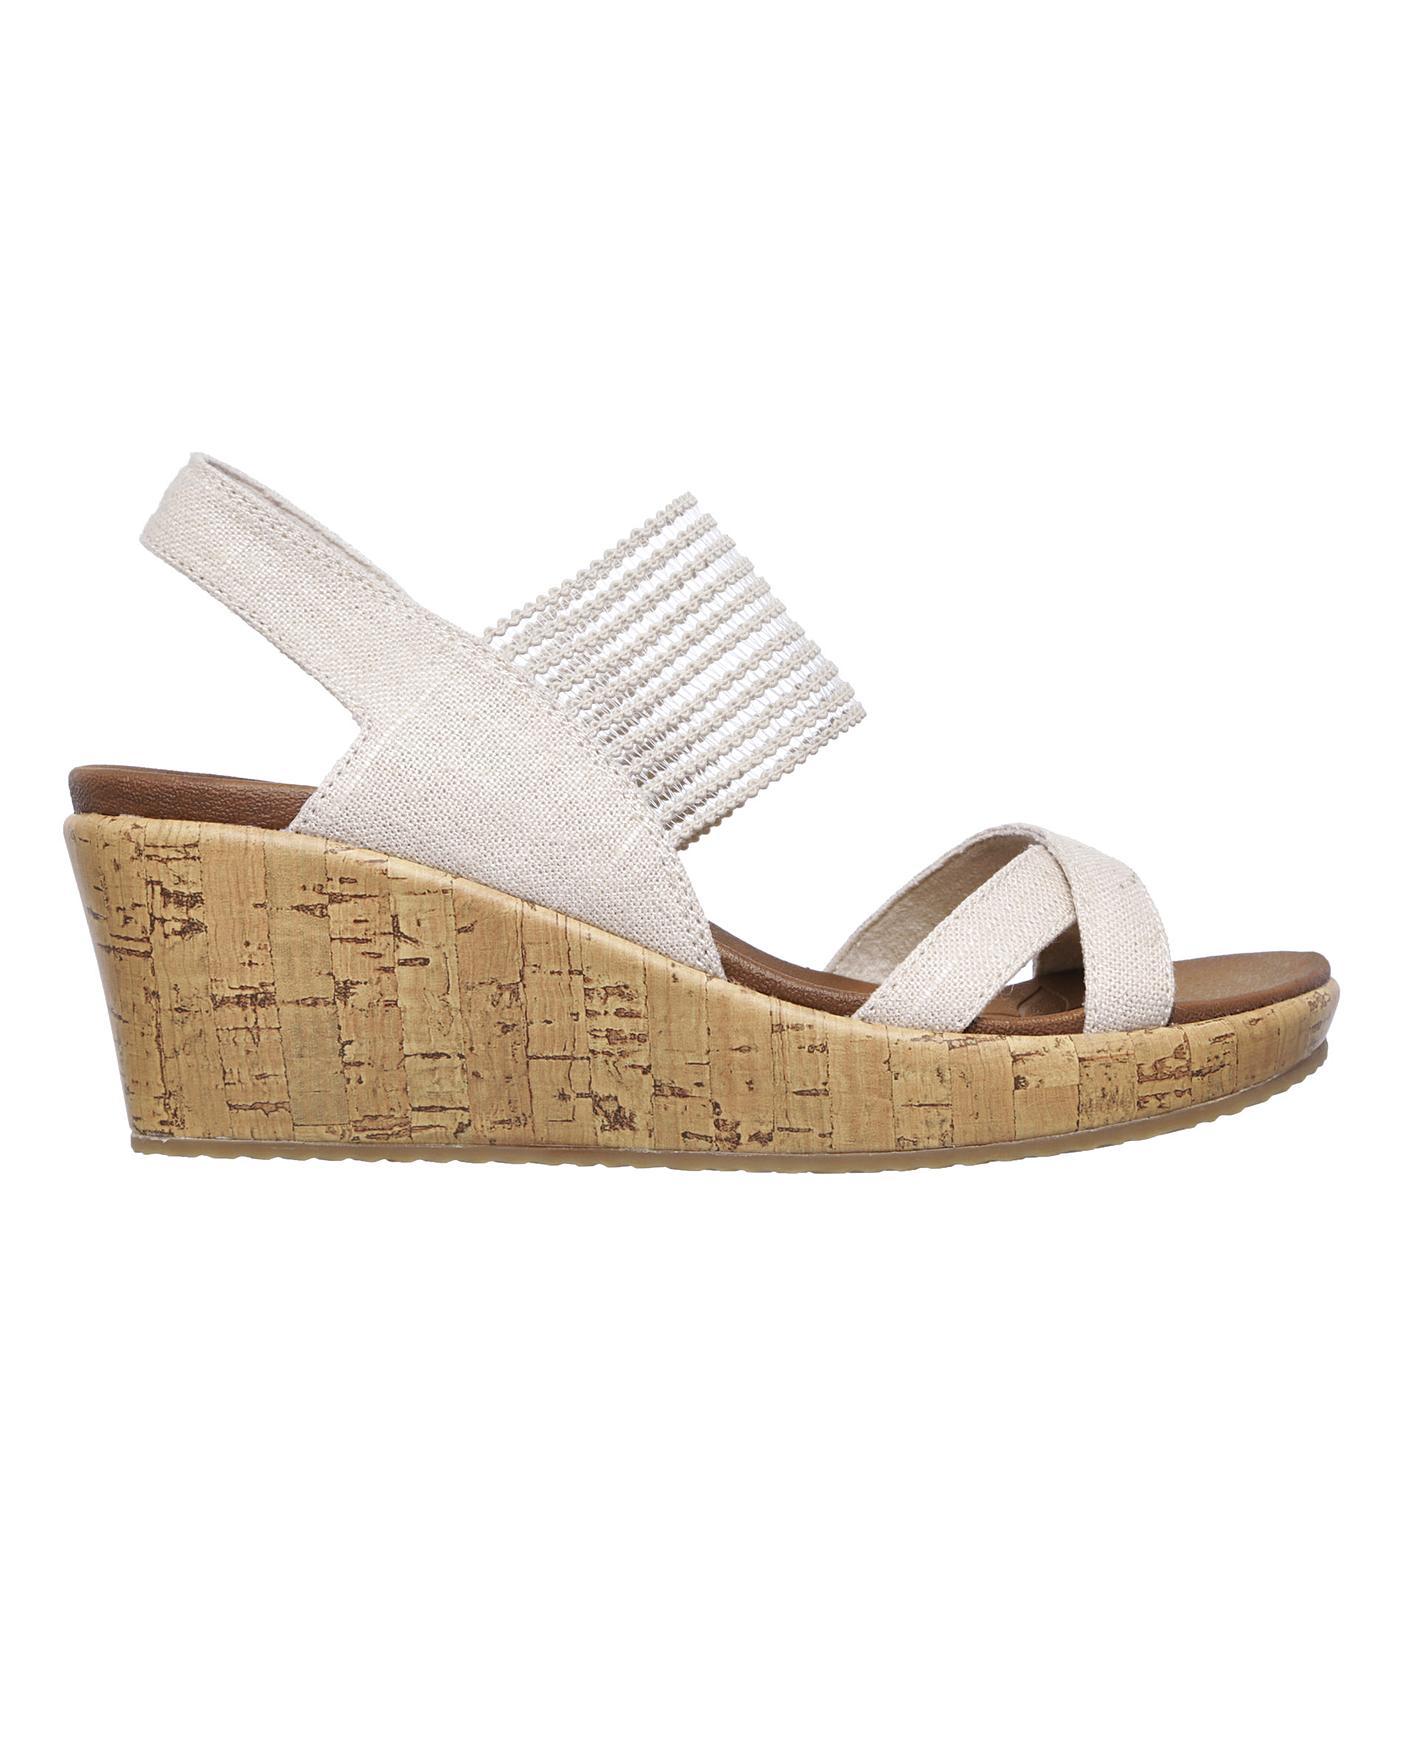 Skechers Wedge Sandals   Marisota